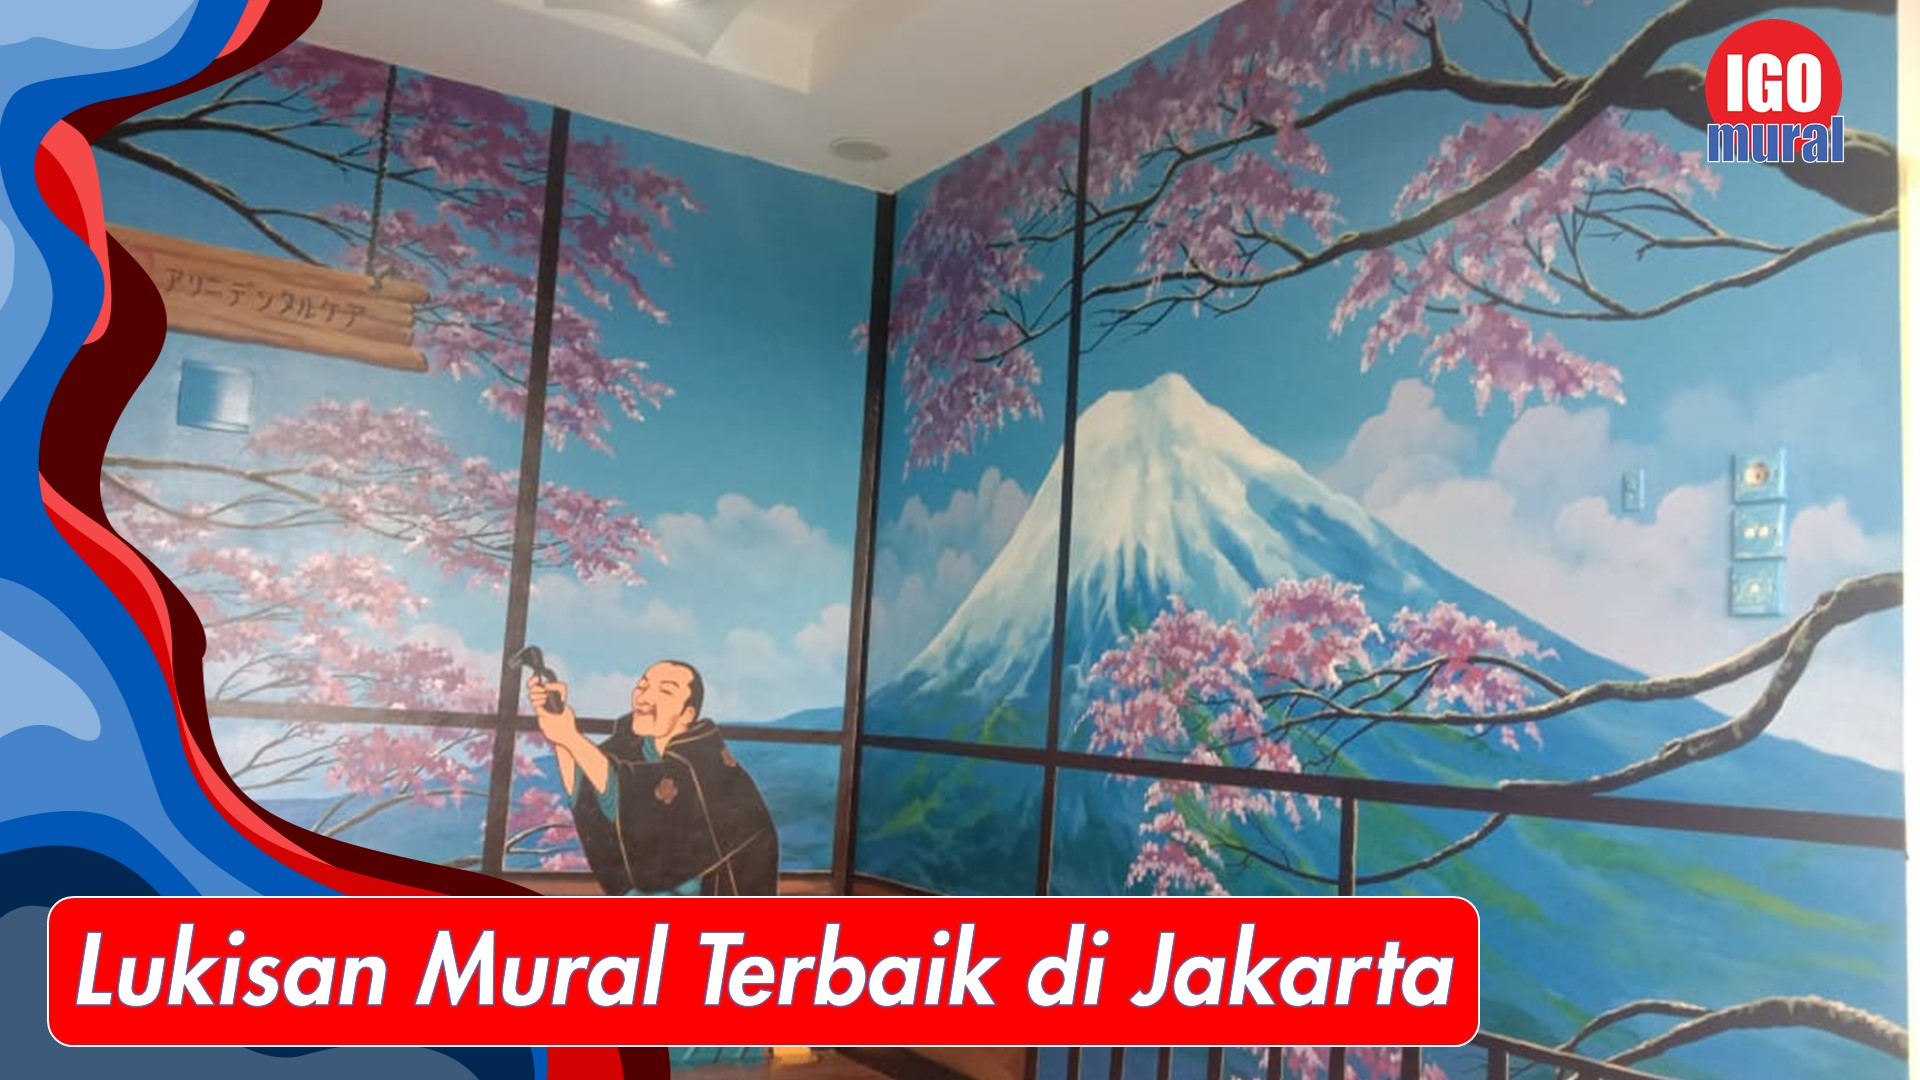 Lukisan Cafe Murah Keren di Jakarta